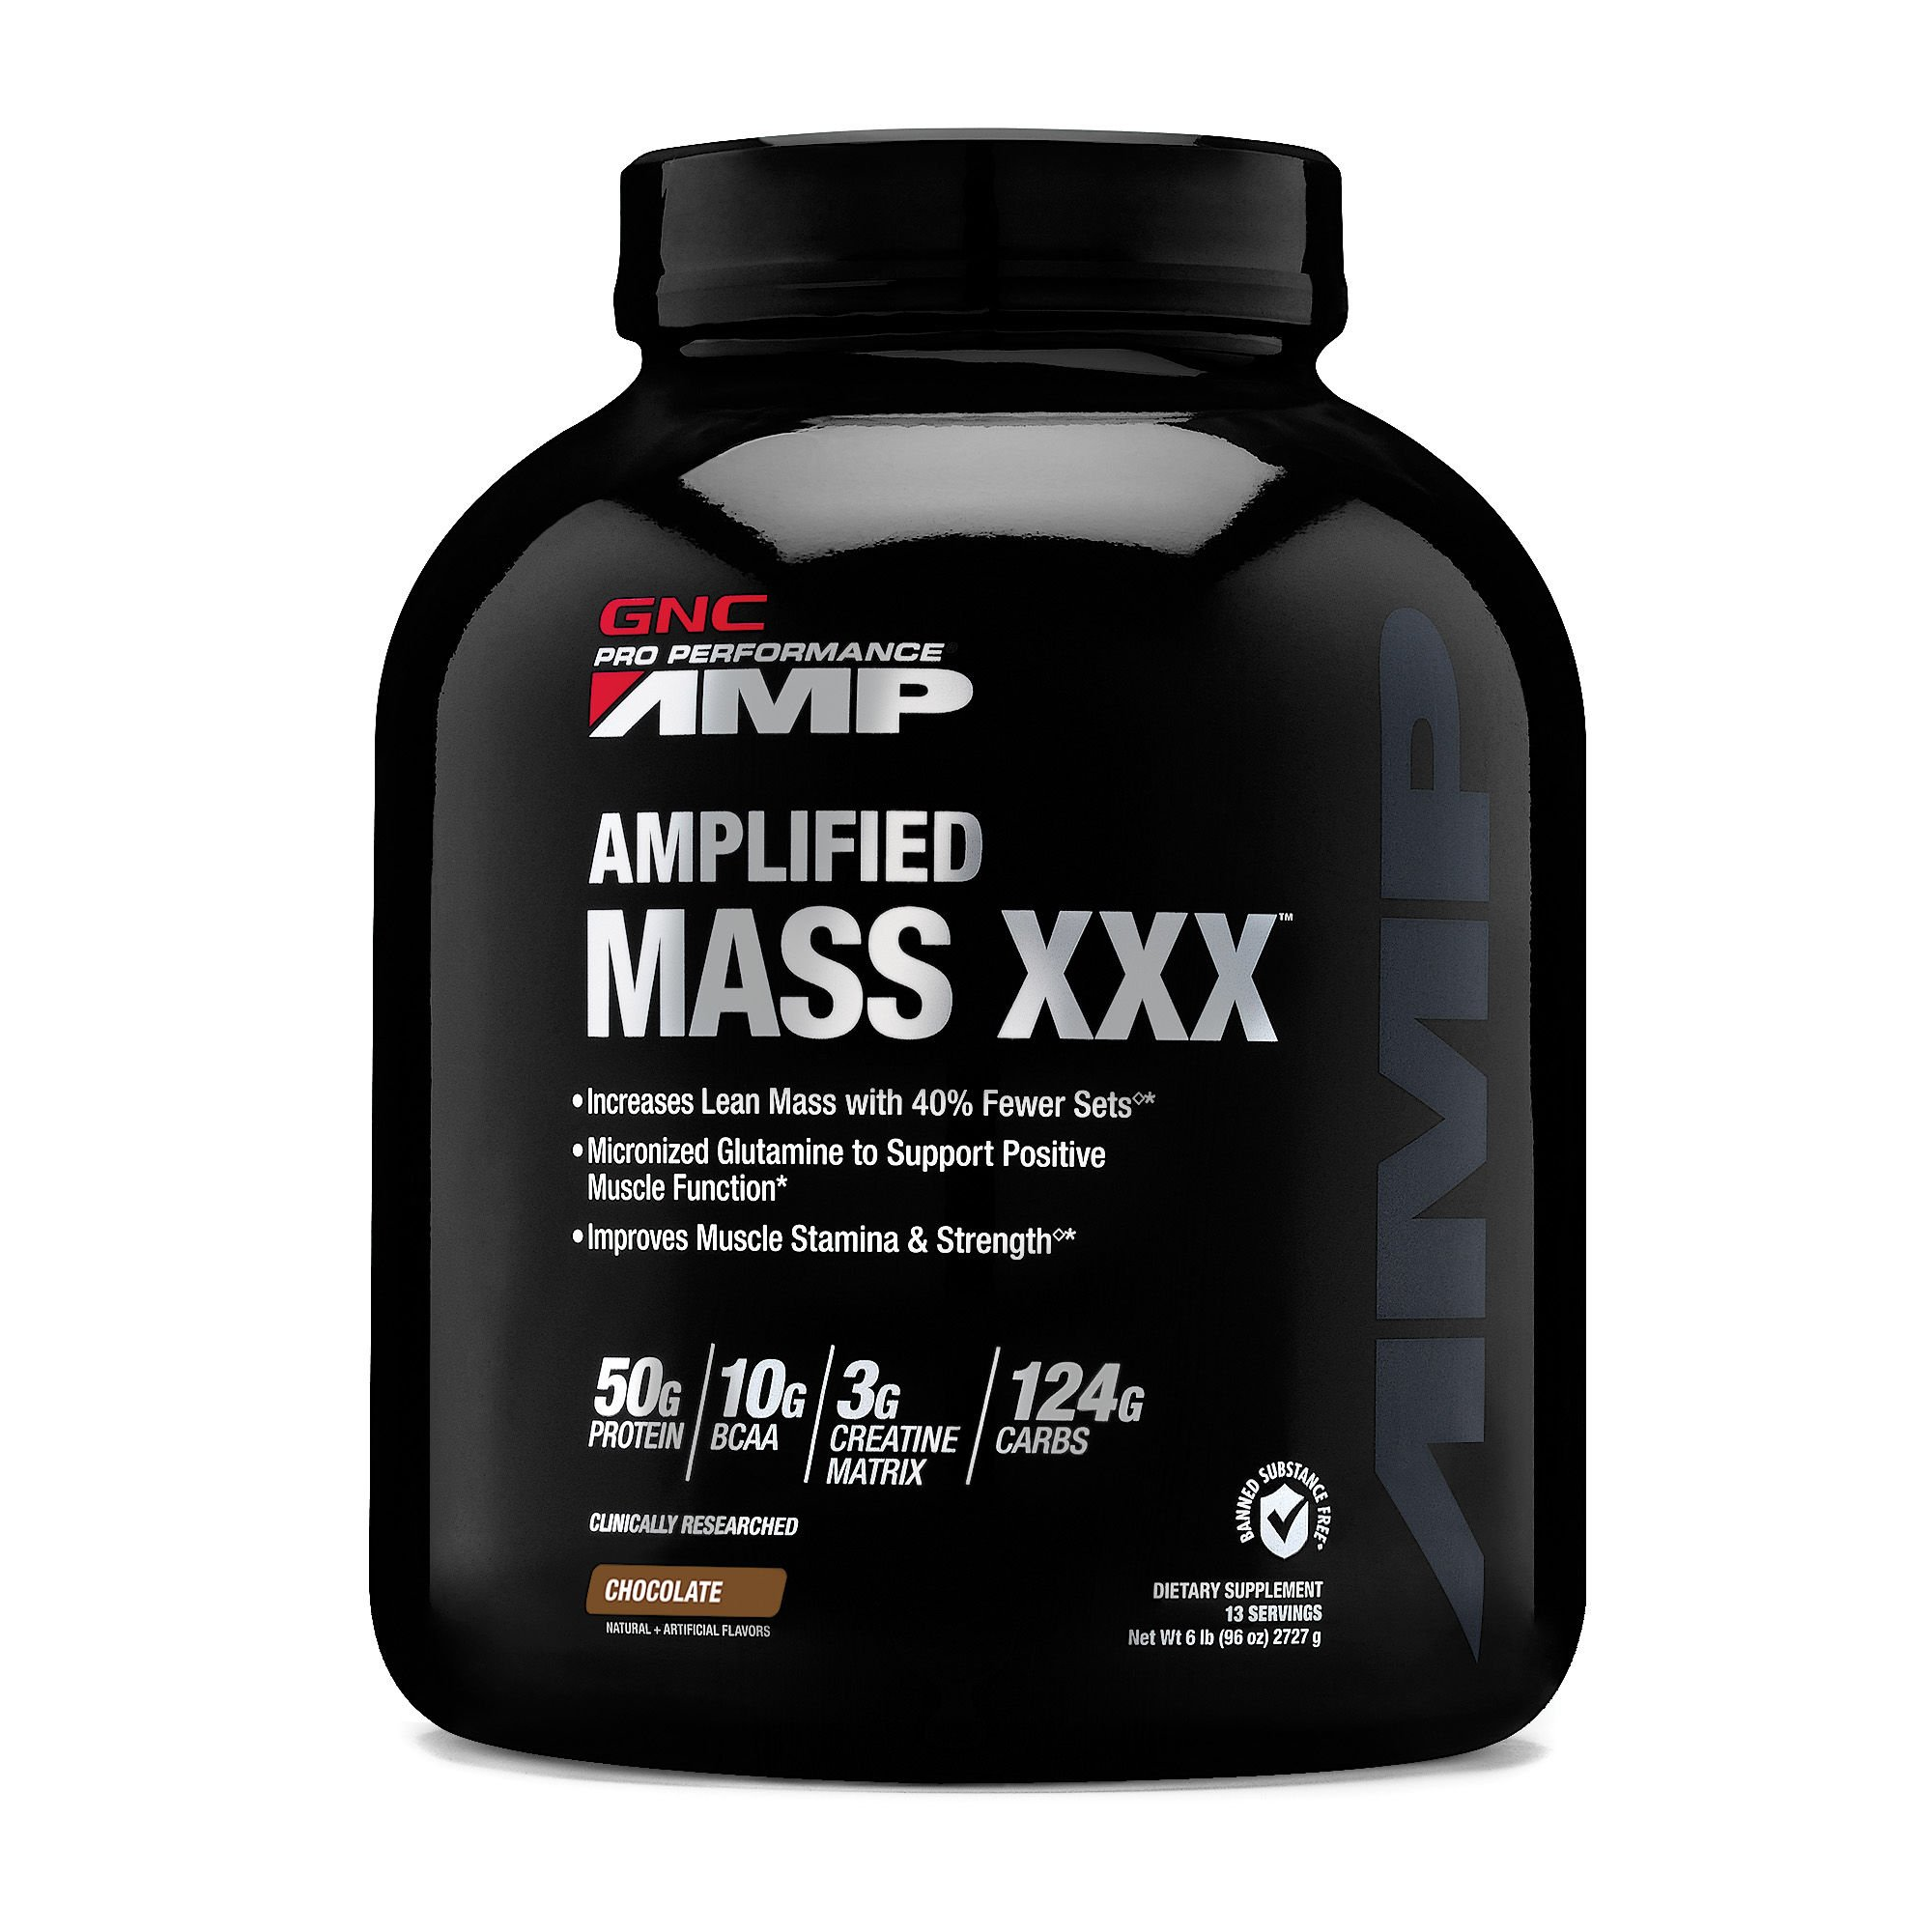 GNC Pro Performance AMP Amplified Mass XXX - Chocolate